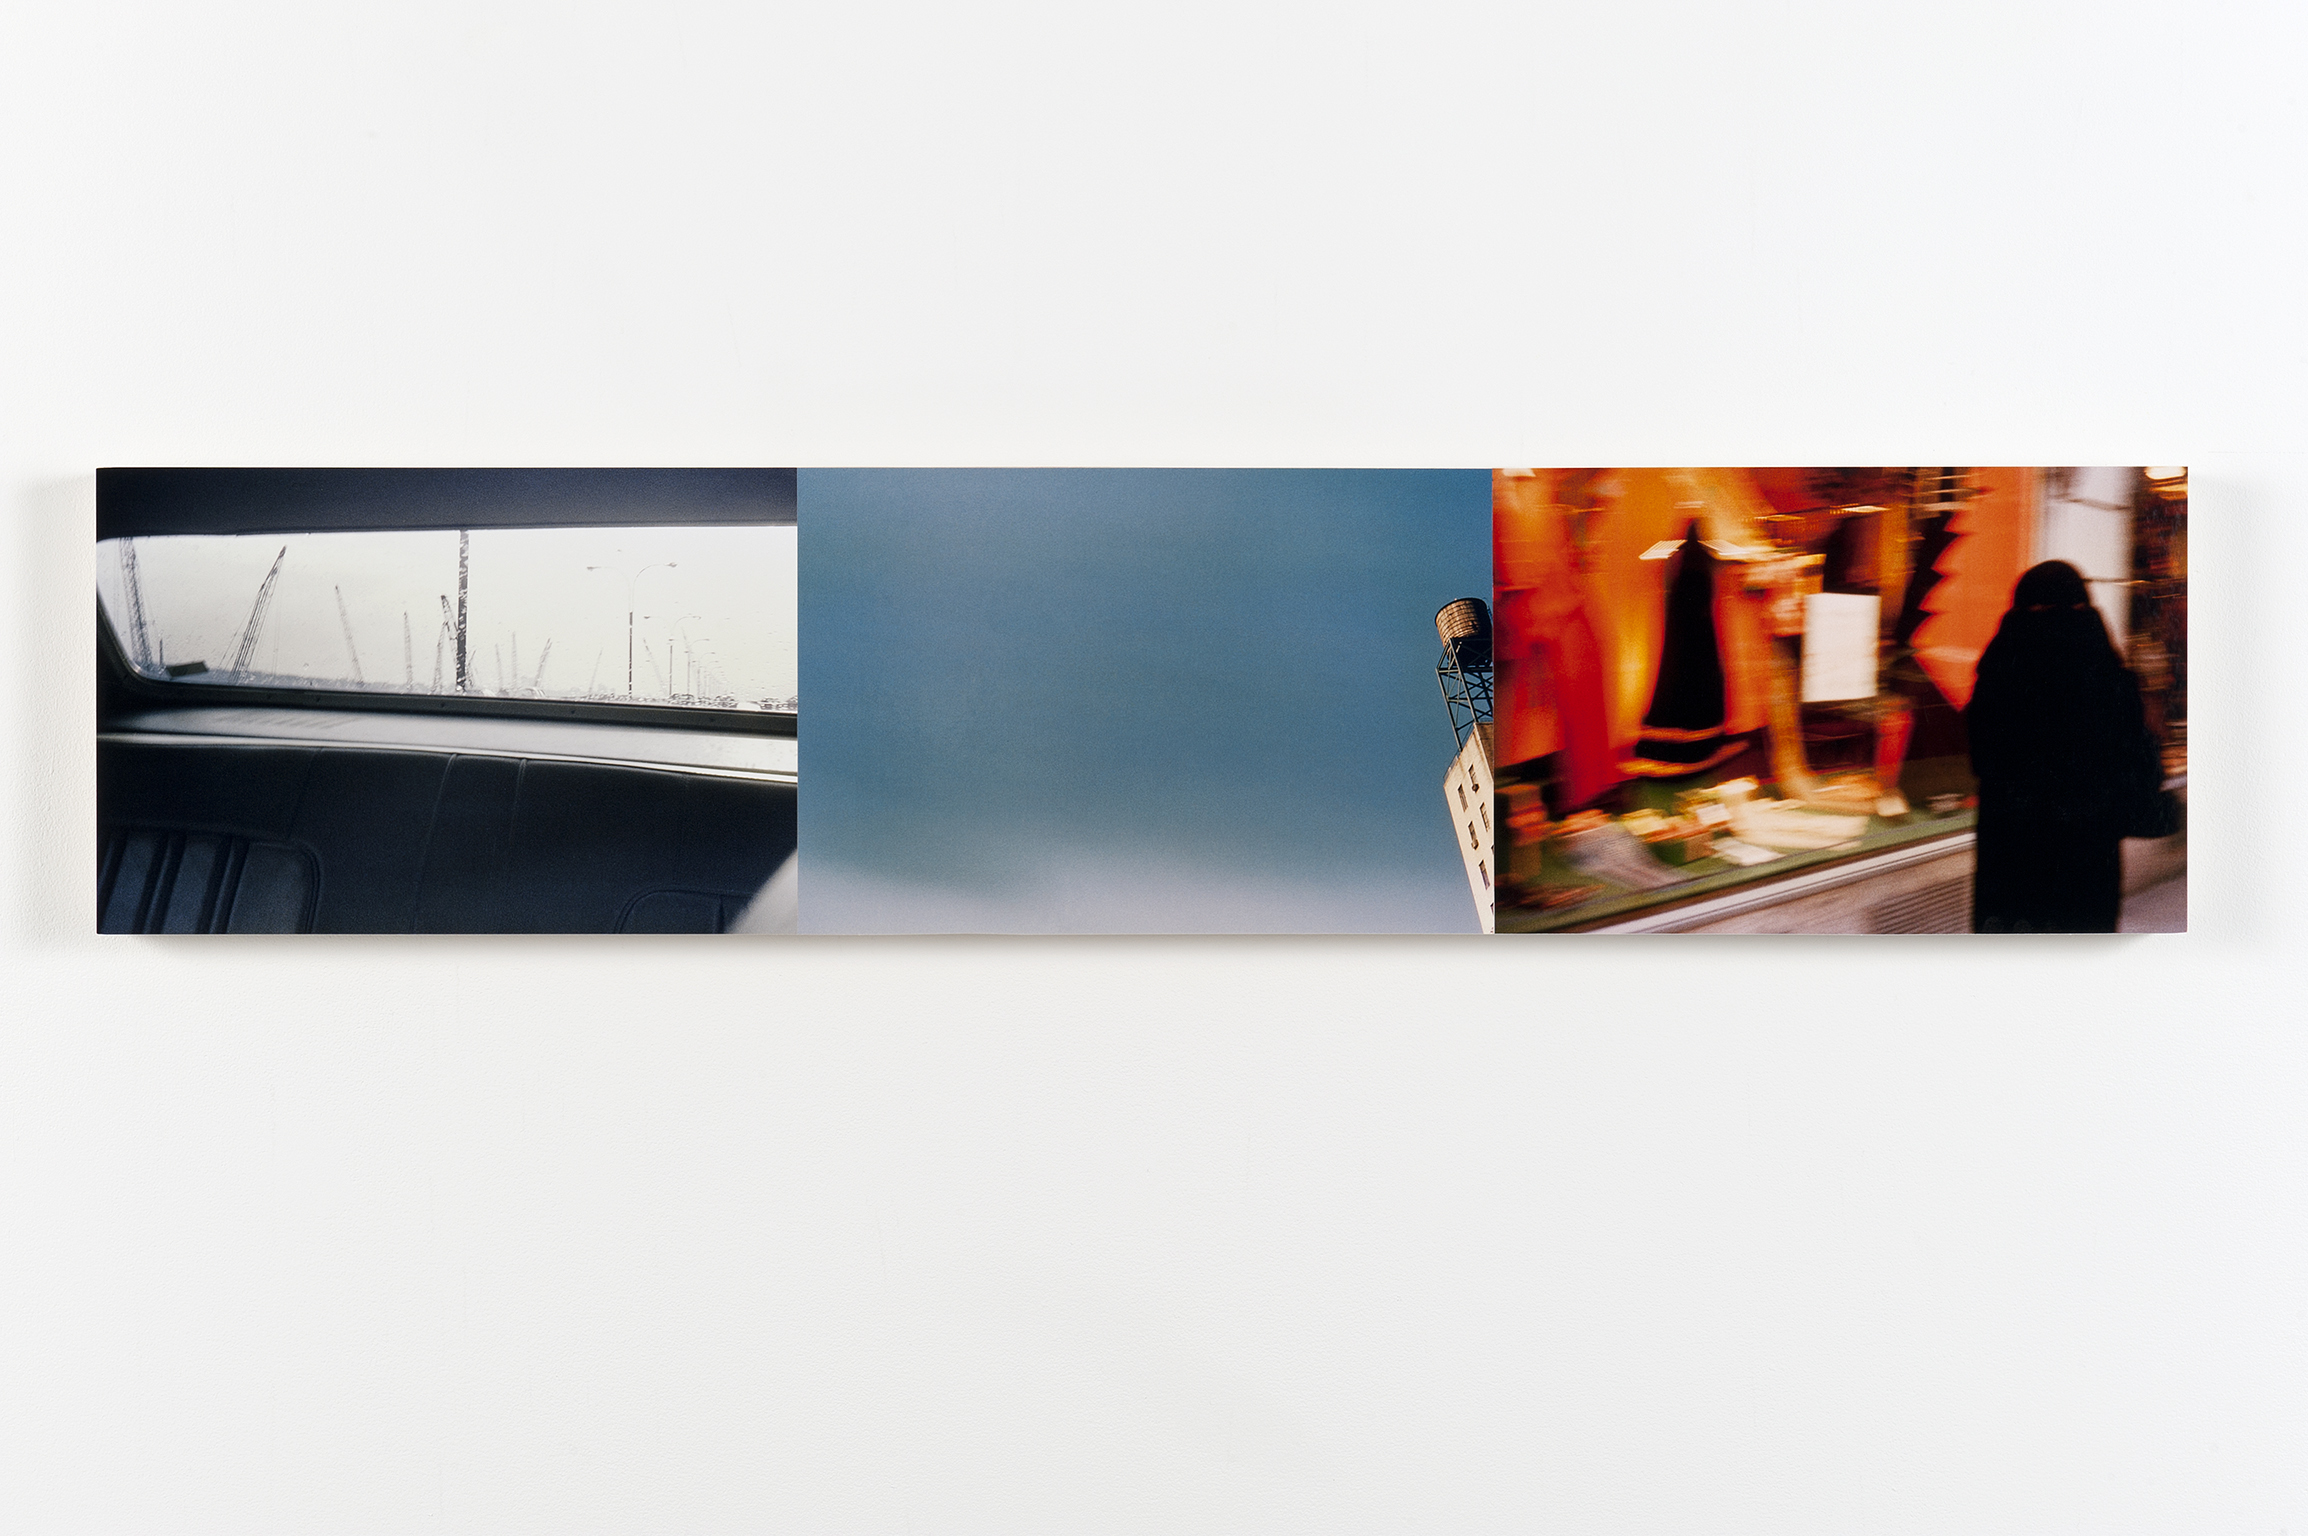 Robert Kleyn, New York Trilogy, 1973–2011, colour photographs, 11 x 49 in. (28 x 125 cm) by